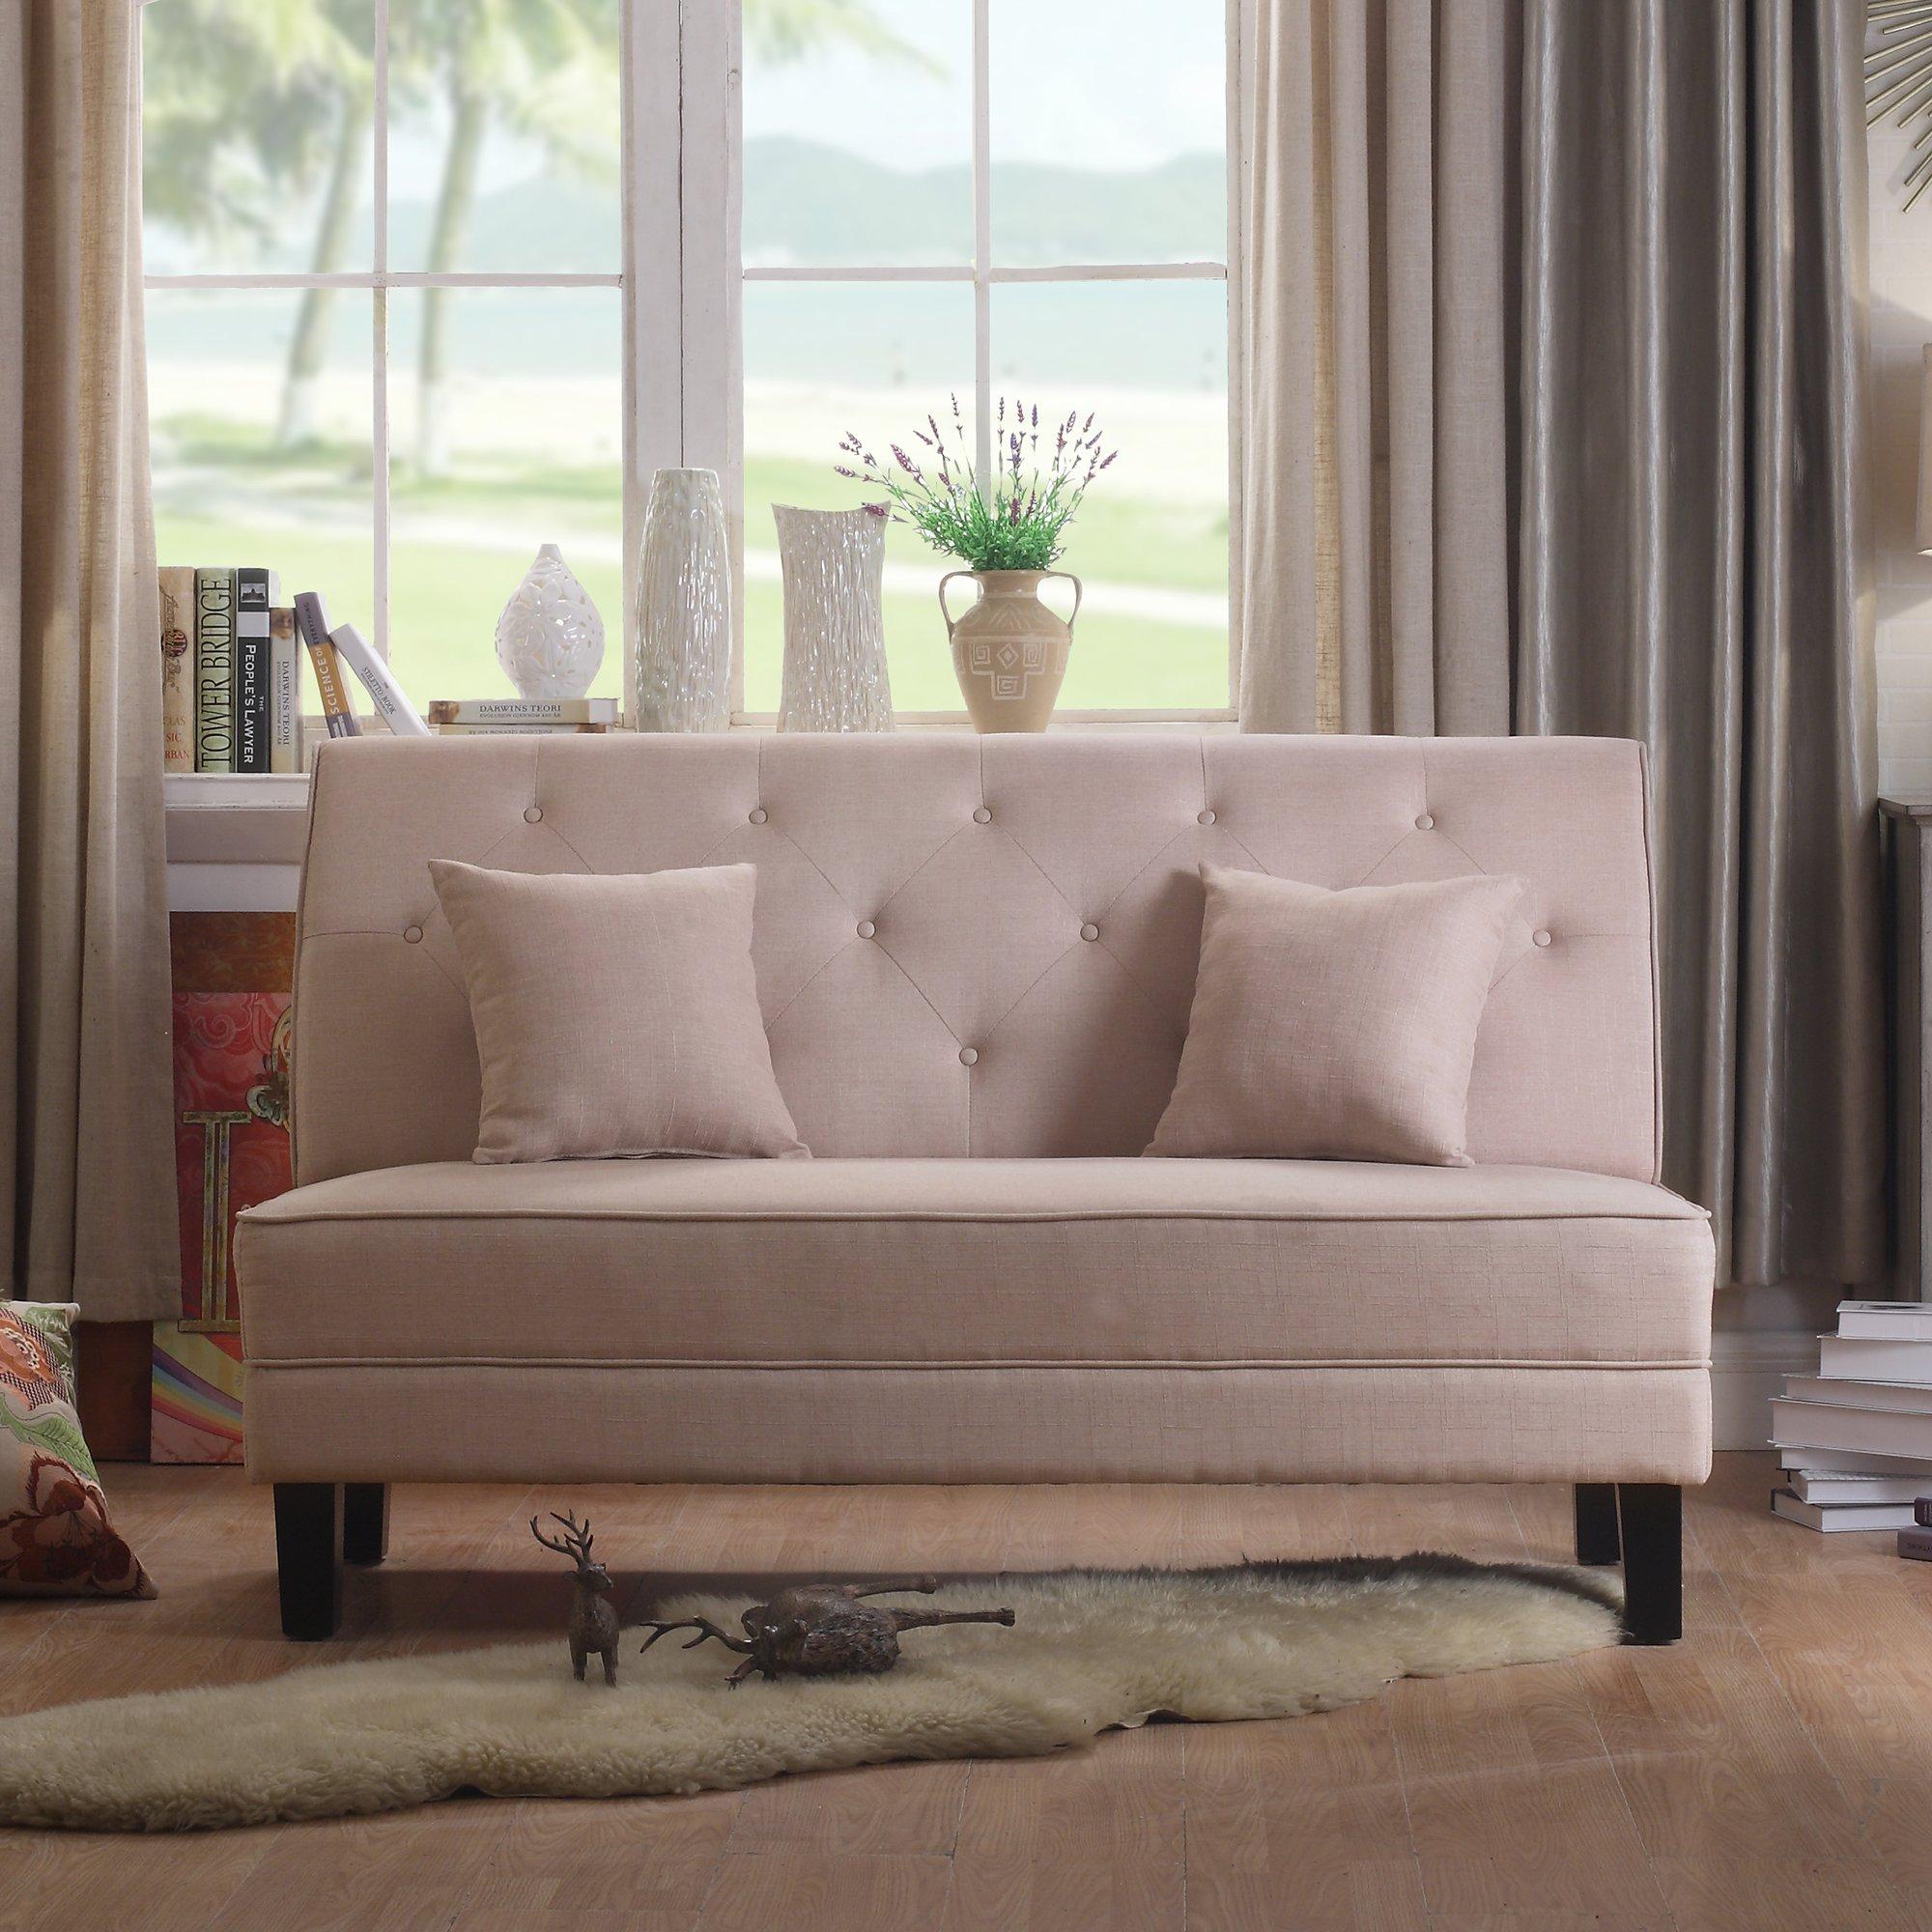 Alton Furniture Grana Tufted Loveseat, Multiple Colors